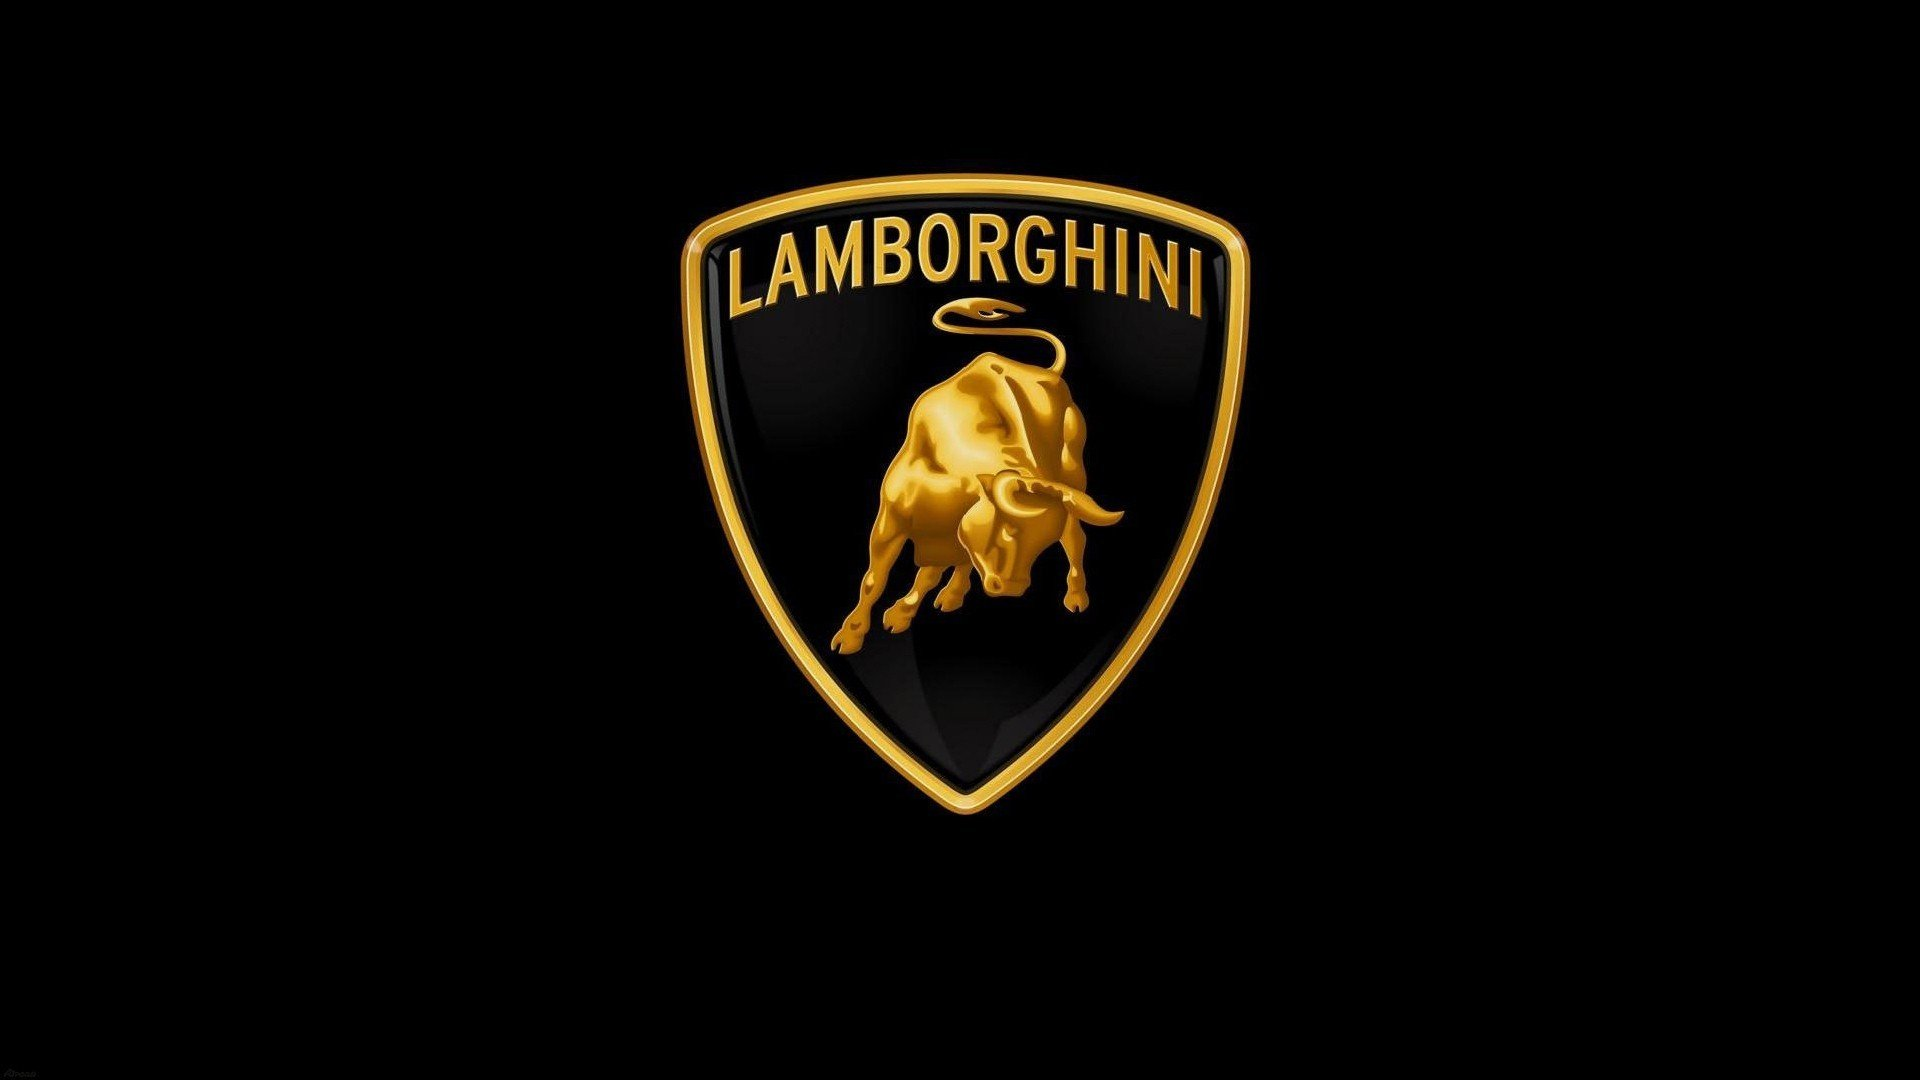 Wallpaper Name  Lamborghini Italian Brand and Manufacturer of Luxury 1920x1080